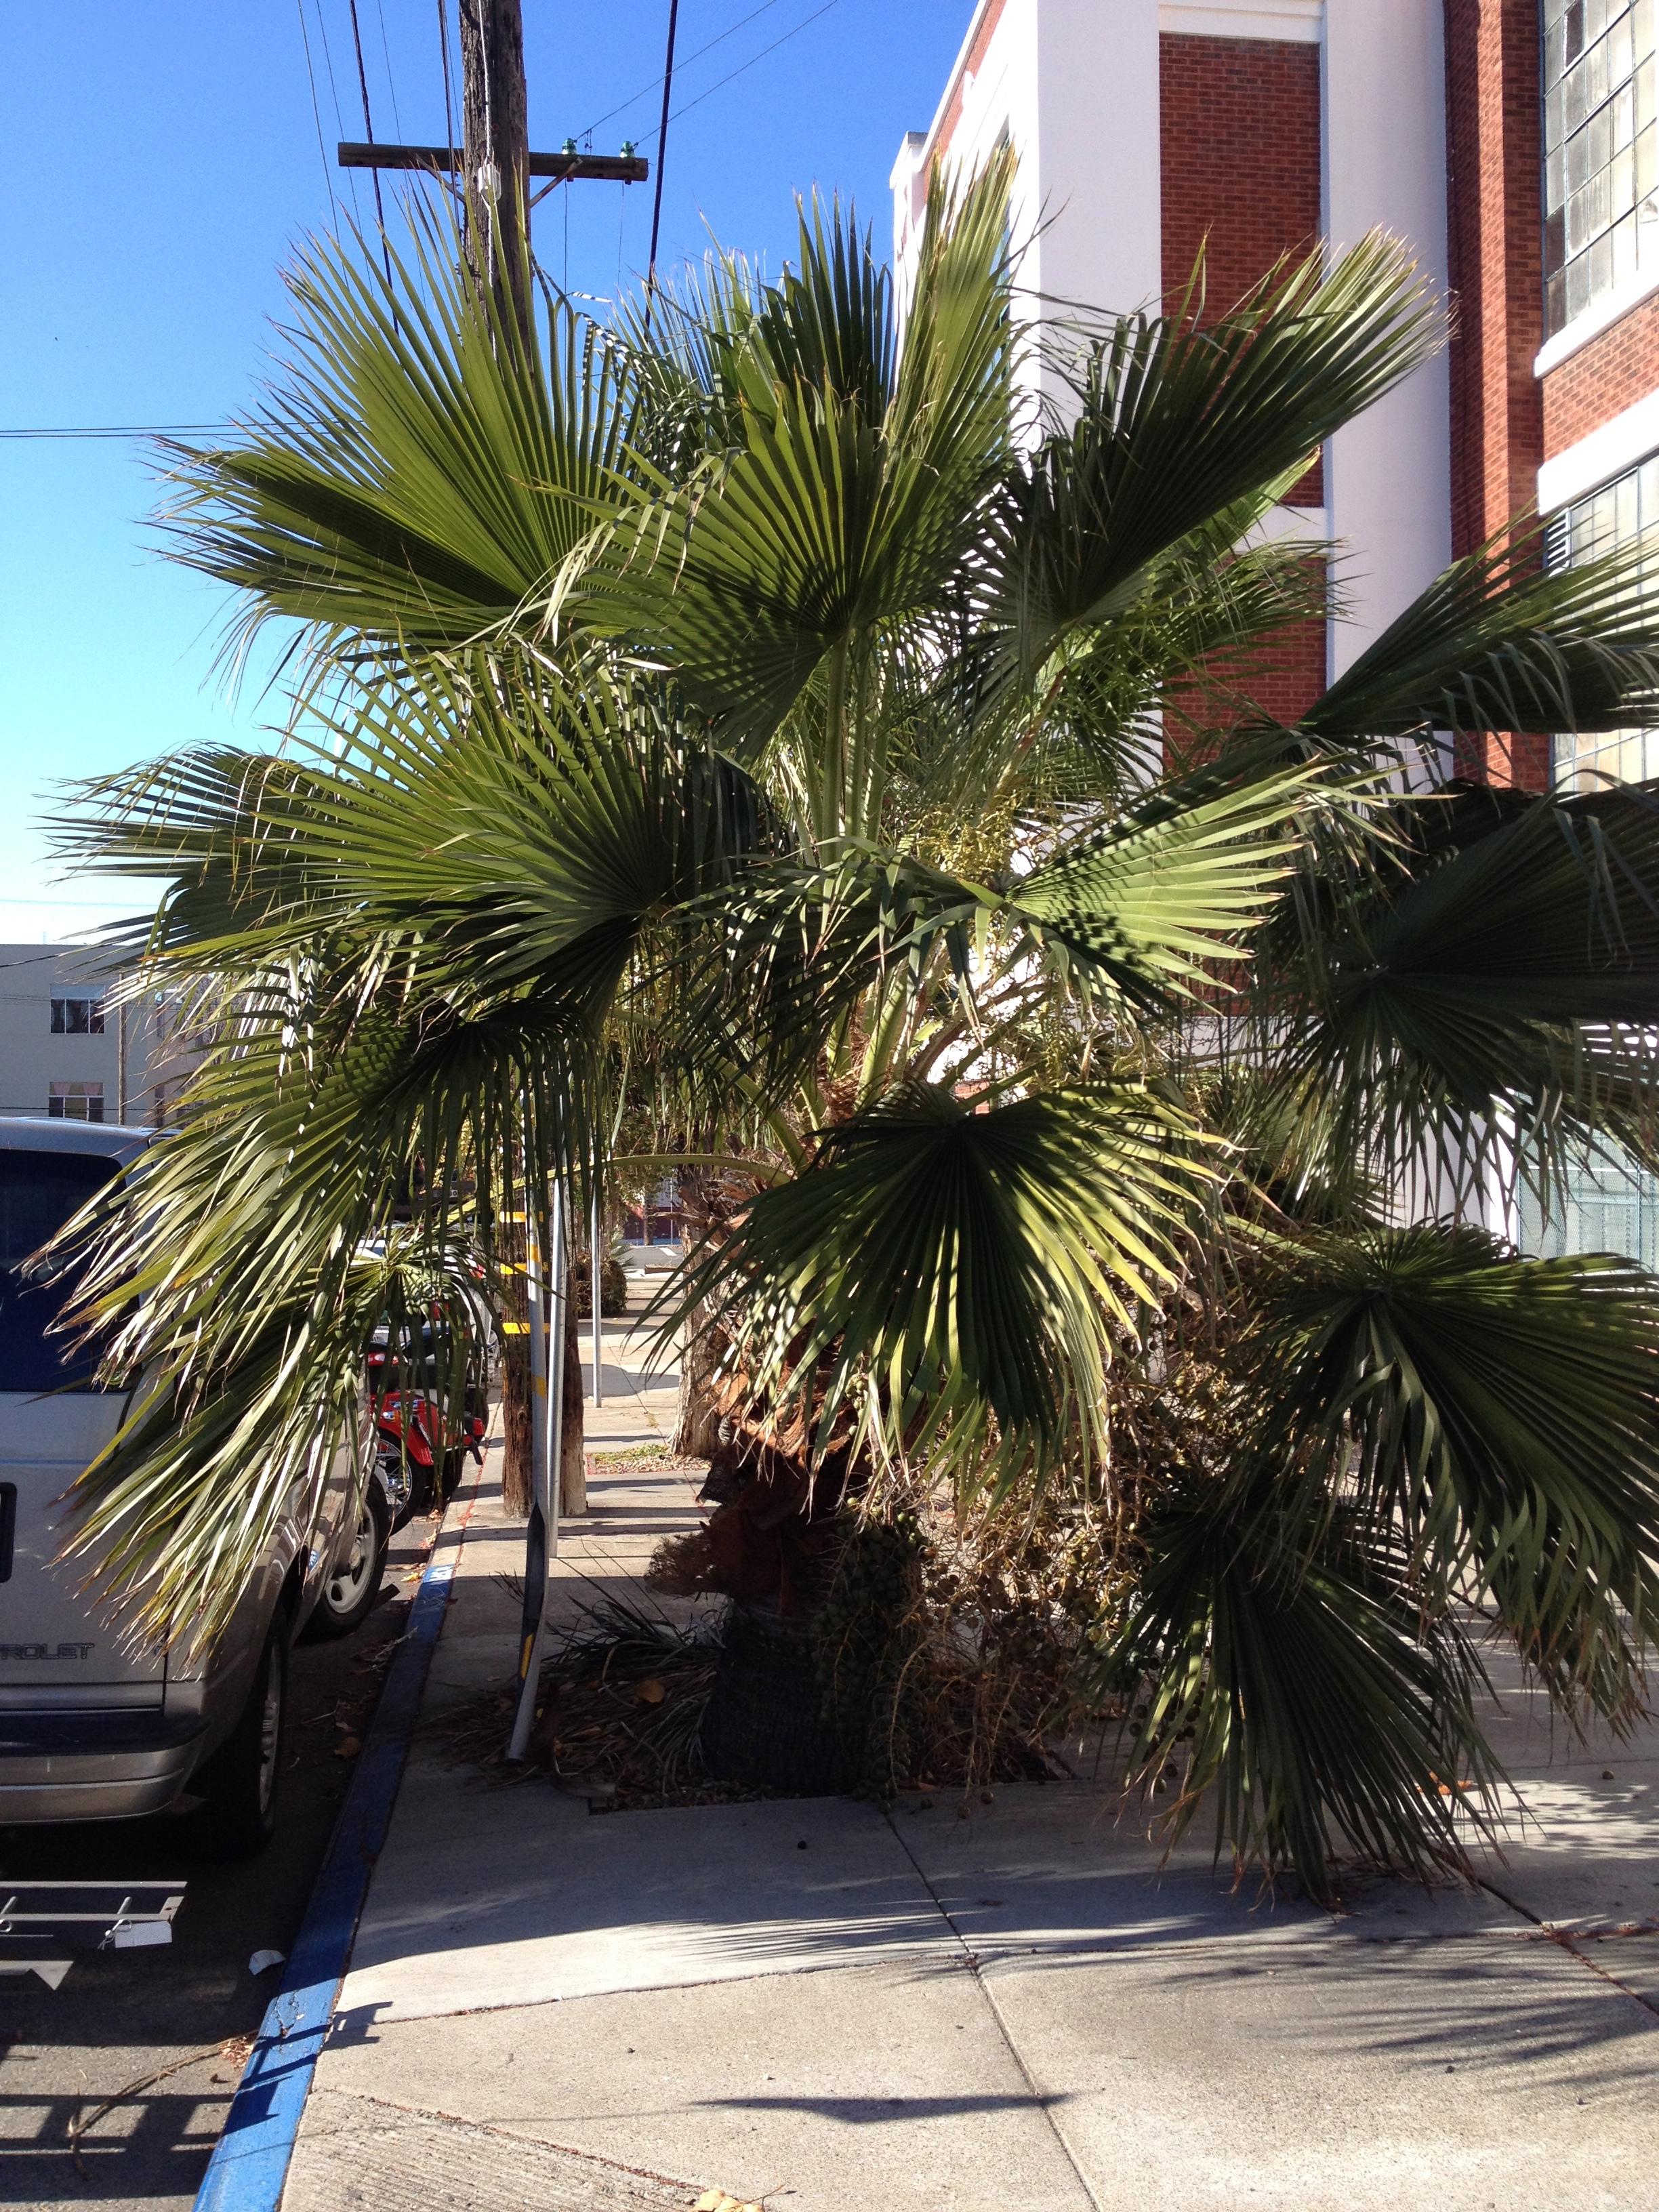 Guadalupe palm at corner of Florida and Mariposa